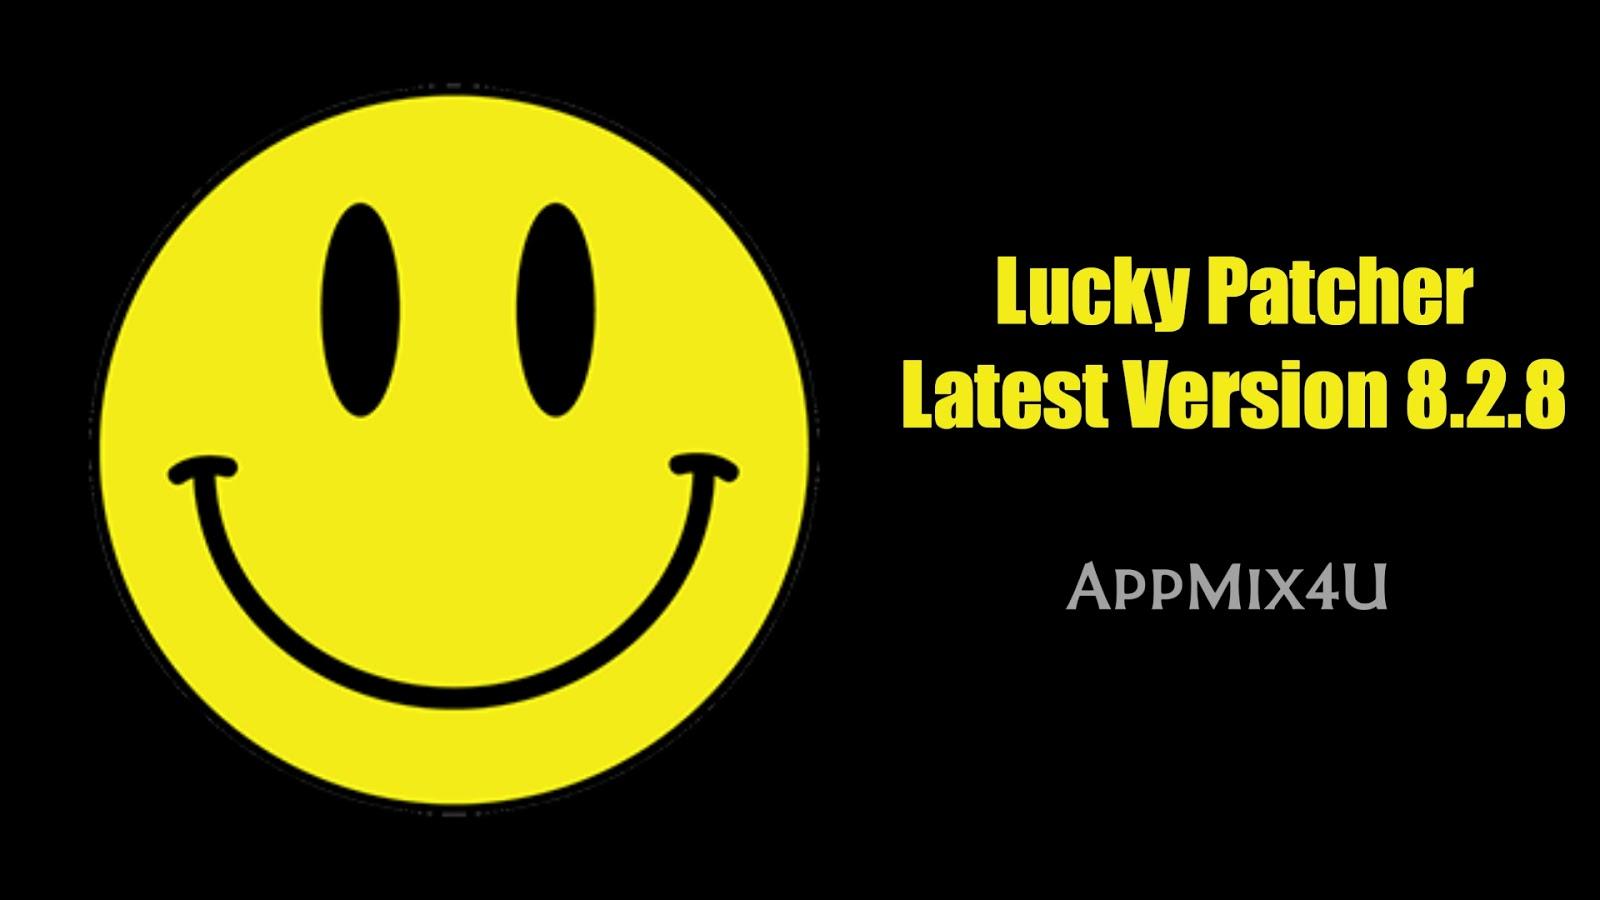 Download Lucky Patcher Mod Apk - iTechBlogs co